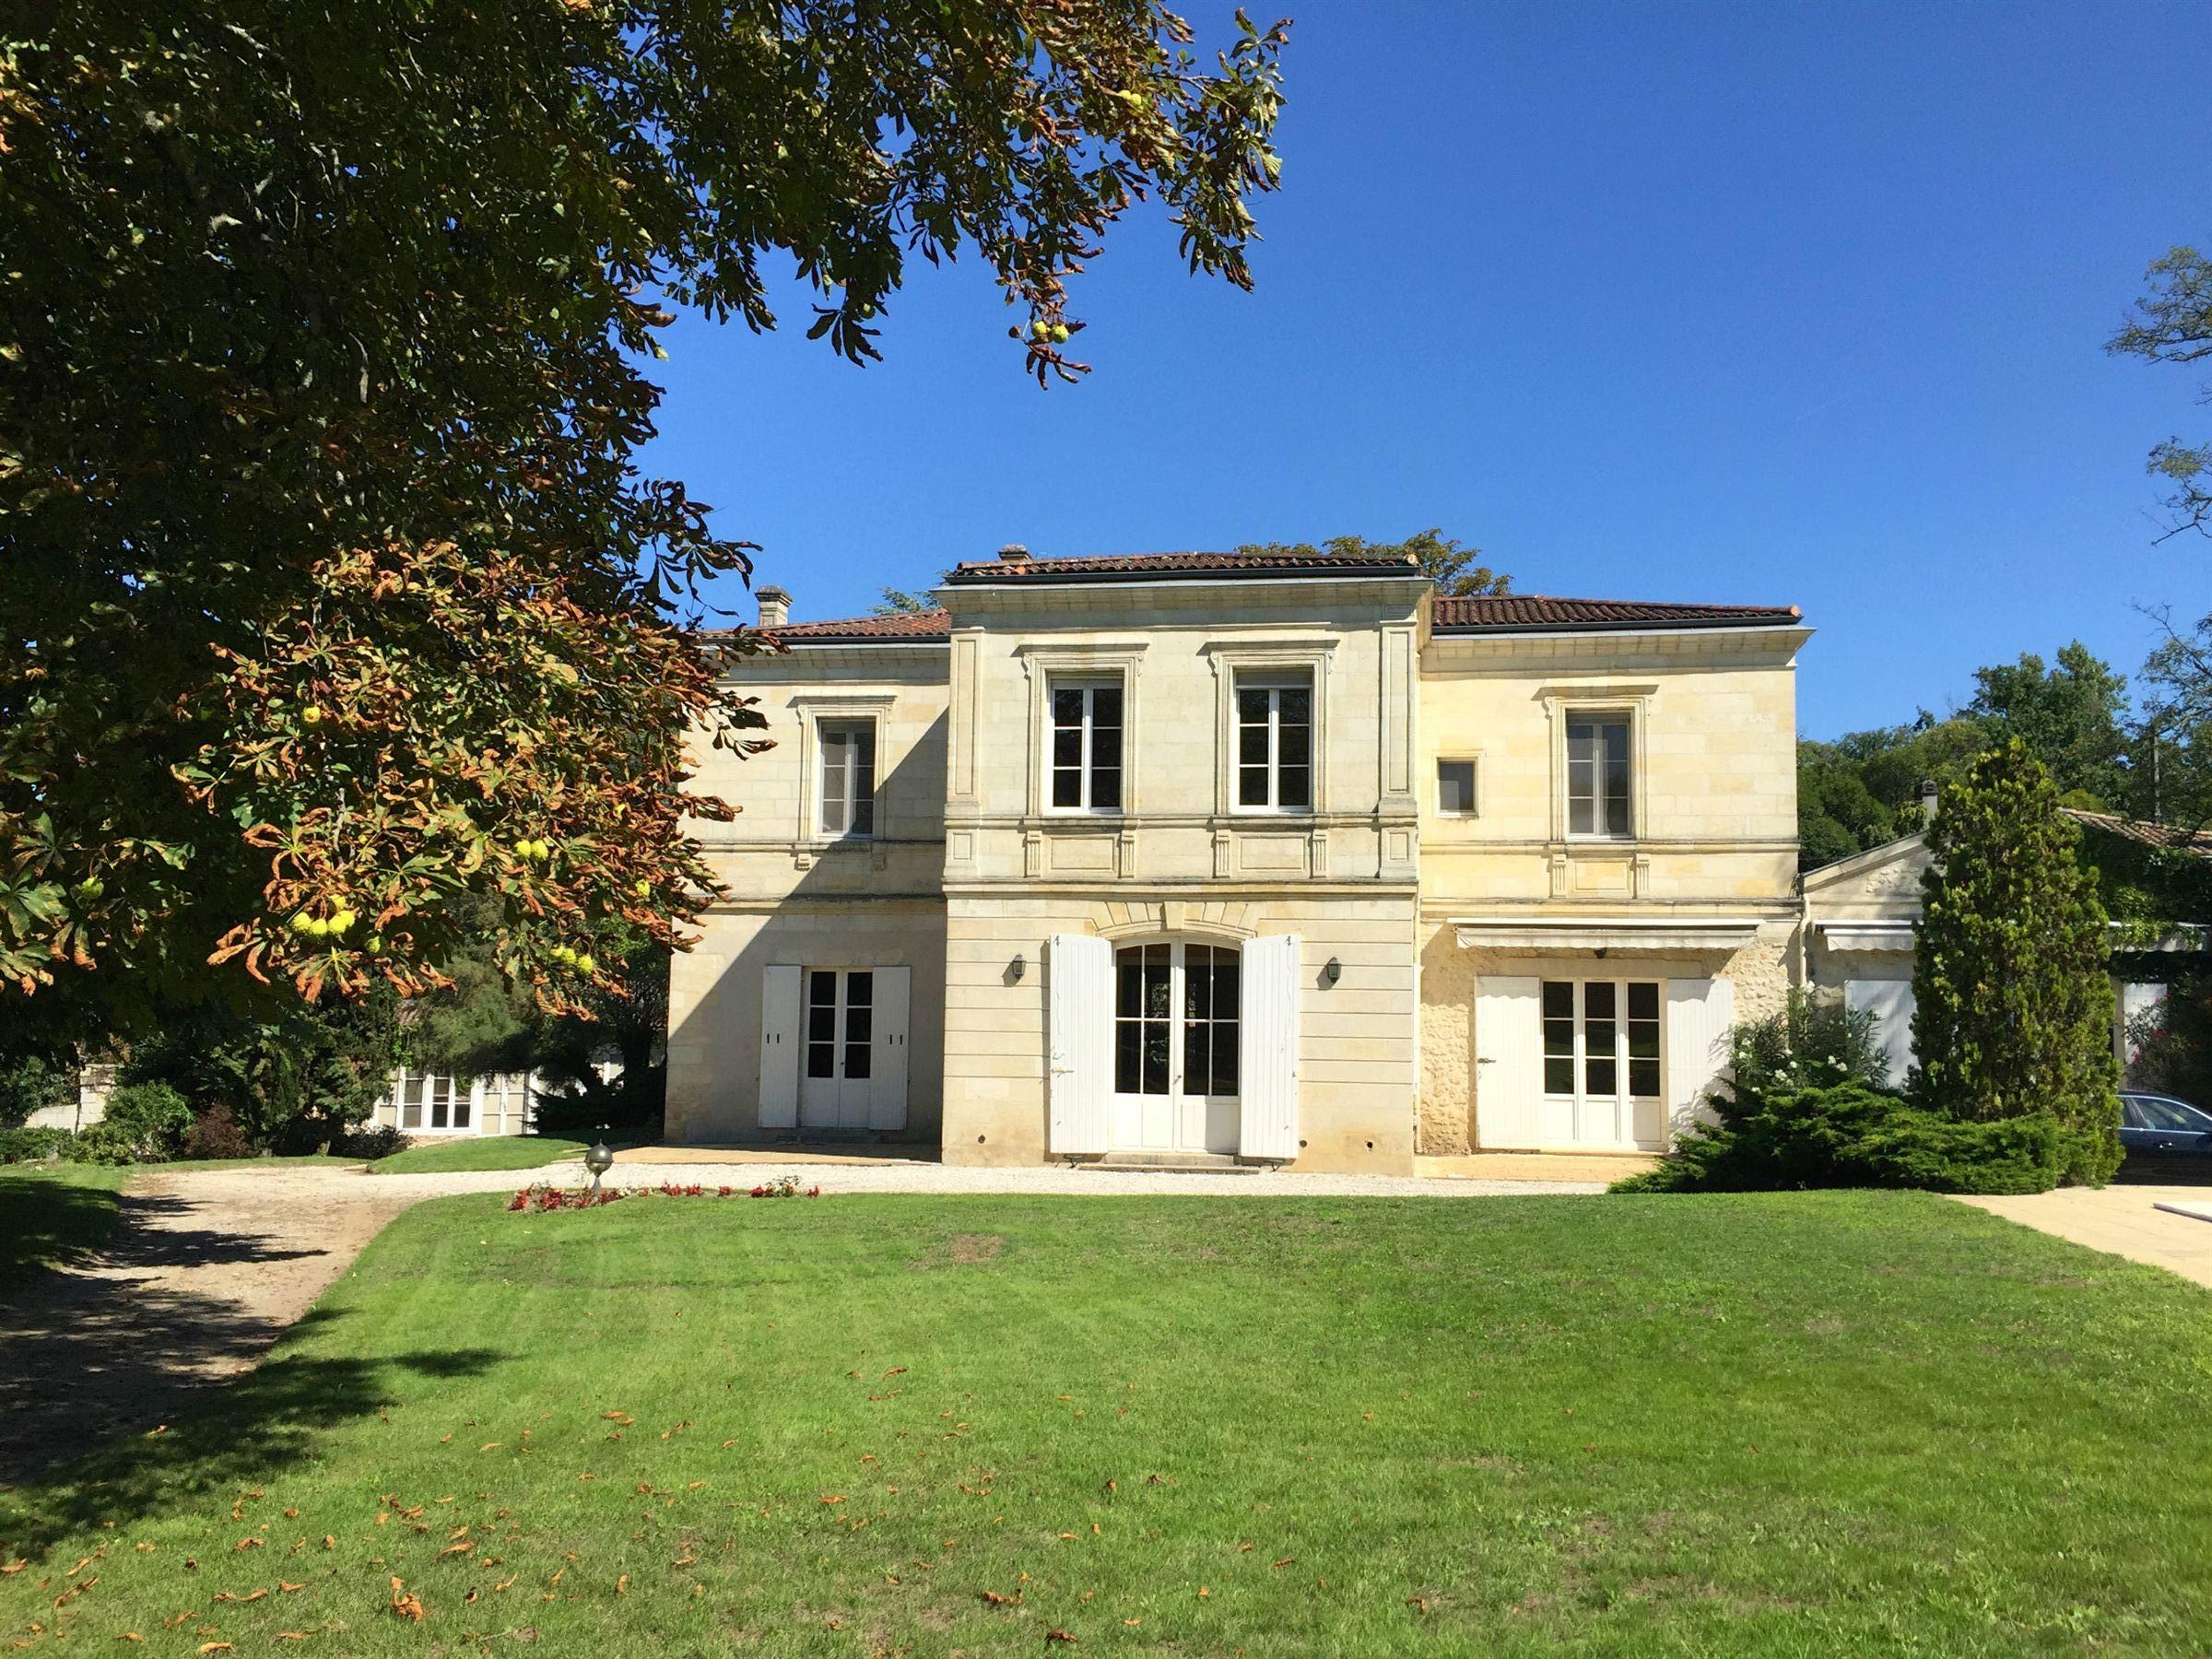 Casa Unifamiliar por un Venta en BORDEAUX RIGHT BANK – PANORAMIC VIEW OVER THE CITY Bordeaux, Aquitania, 33000 Francia